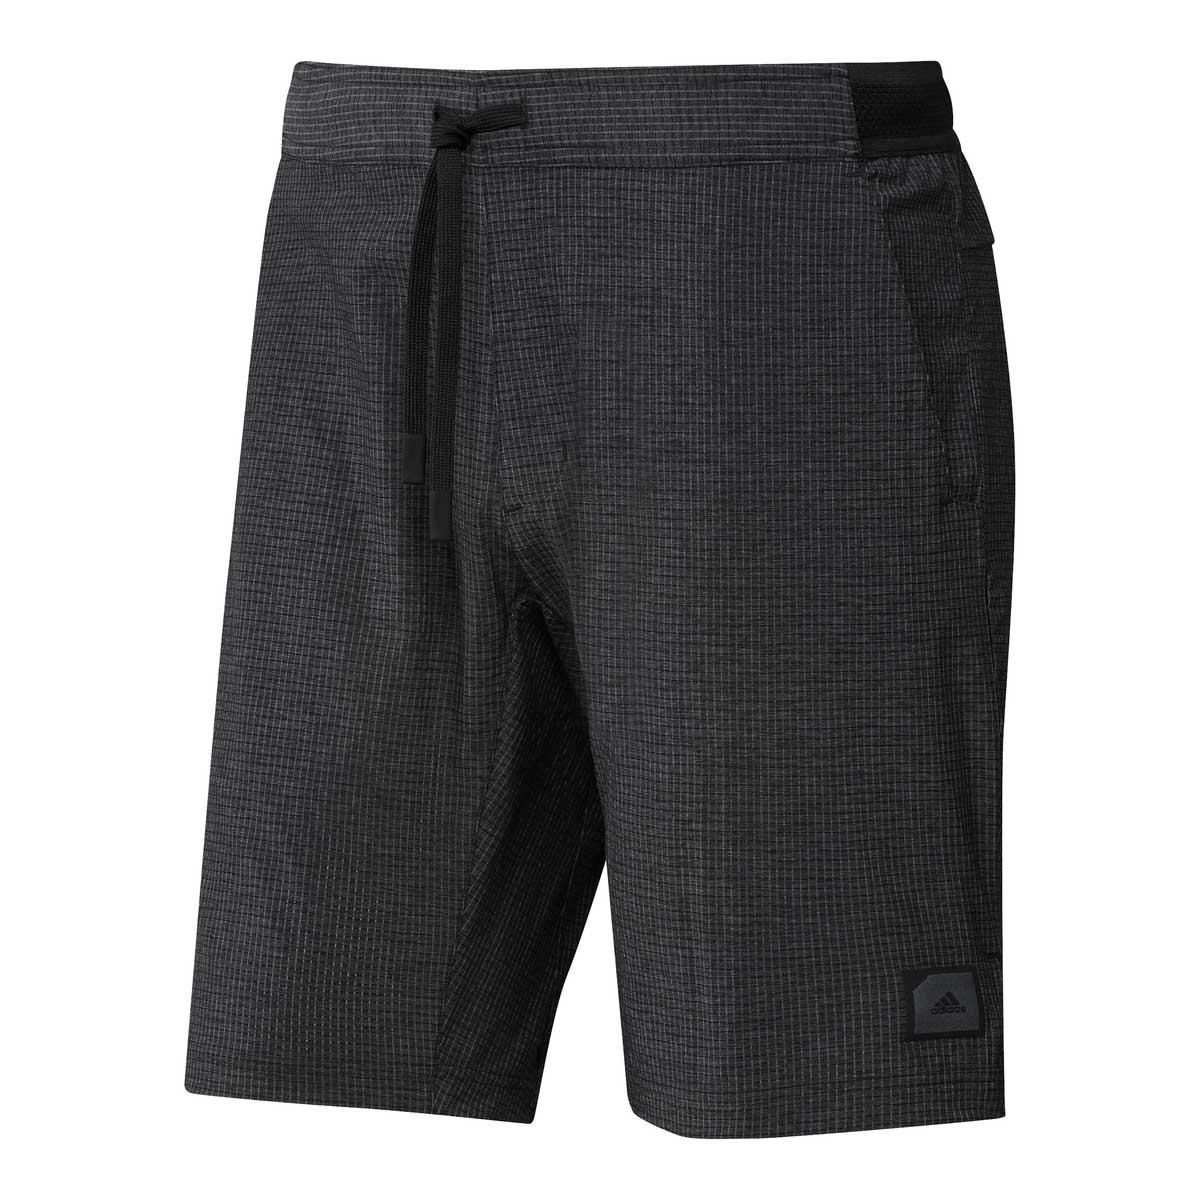 Adidas Men's Adicross Black Hybrid Short